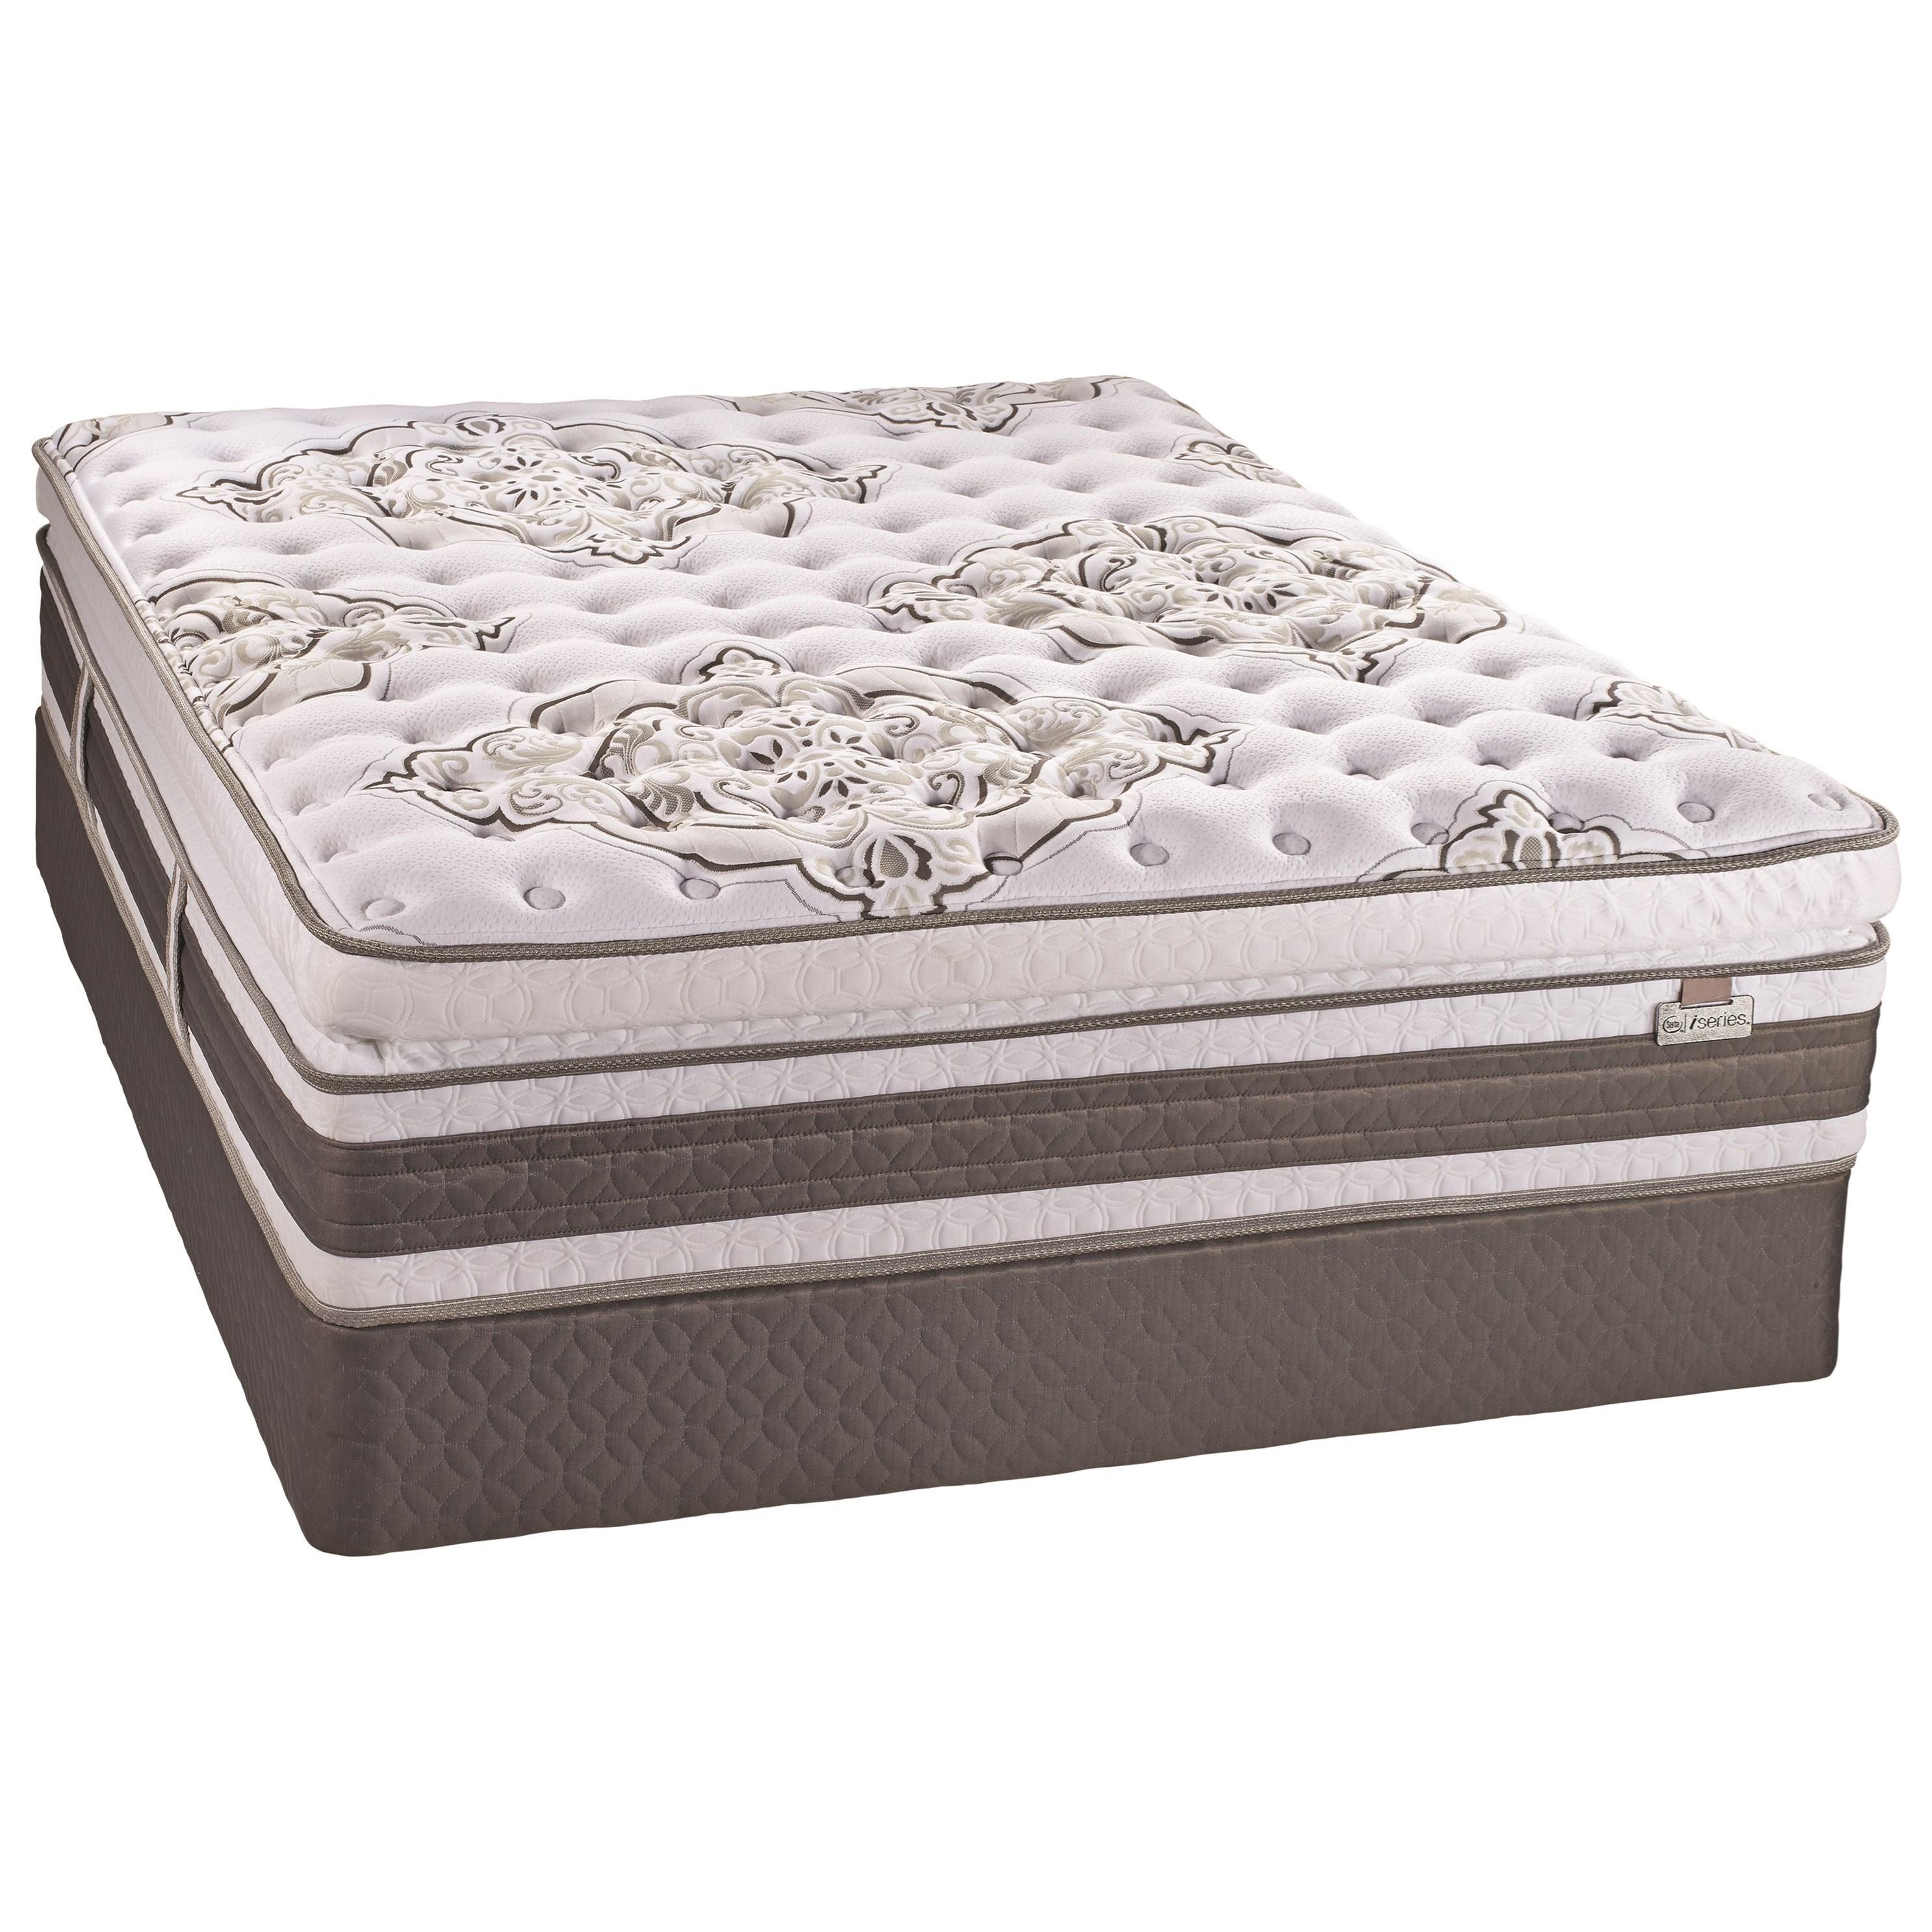 Serta Canada Notable II SPT Plush Queen Super Pillow Top Plush Mattress - Item Number: 500421143-Q